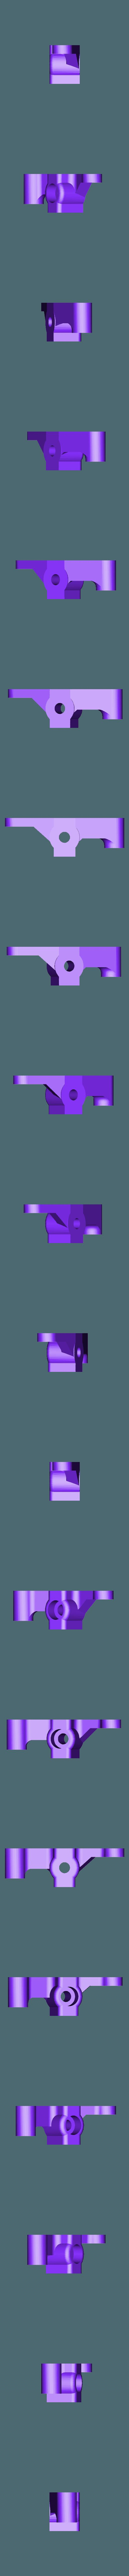 Wheelhub_inv.STL Download free STL file Printed truck V2: Front axle • 3D printable design, MrCrankyface